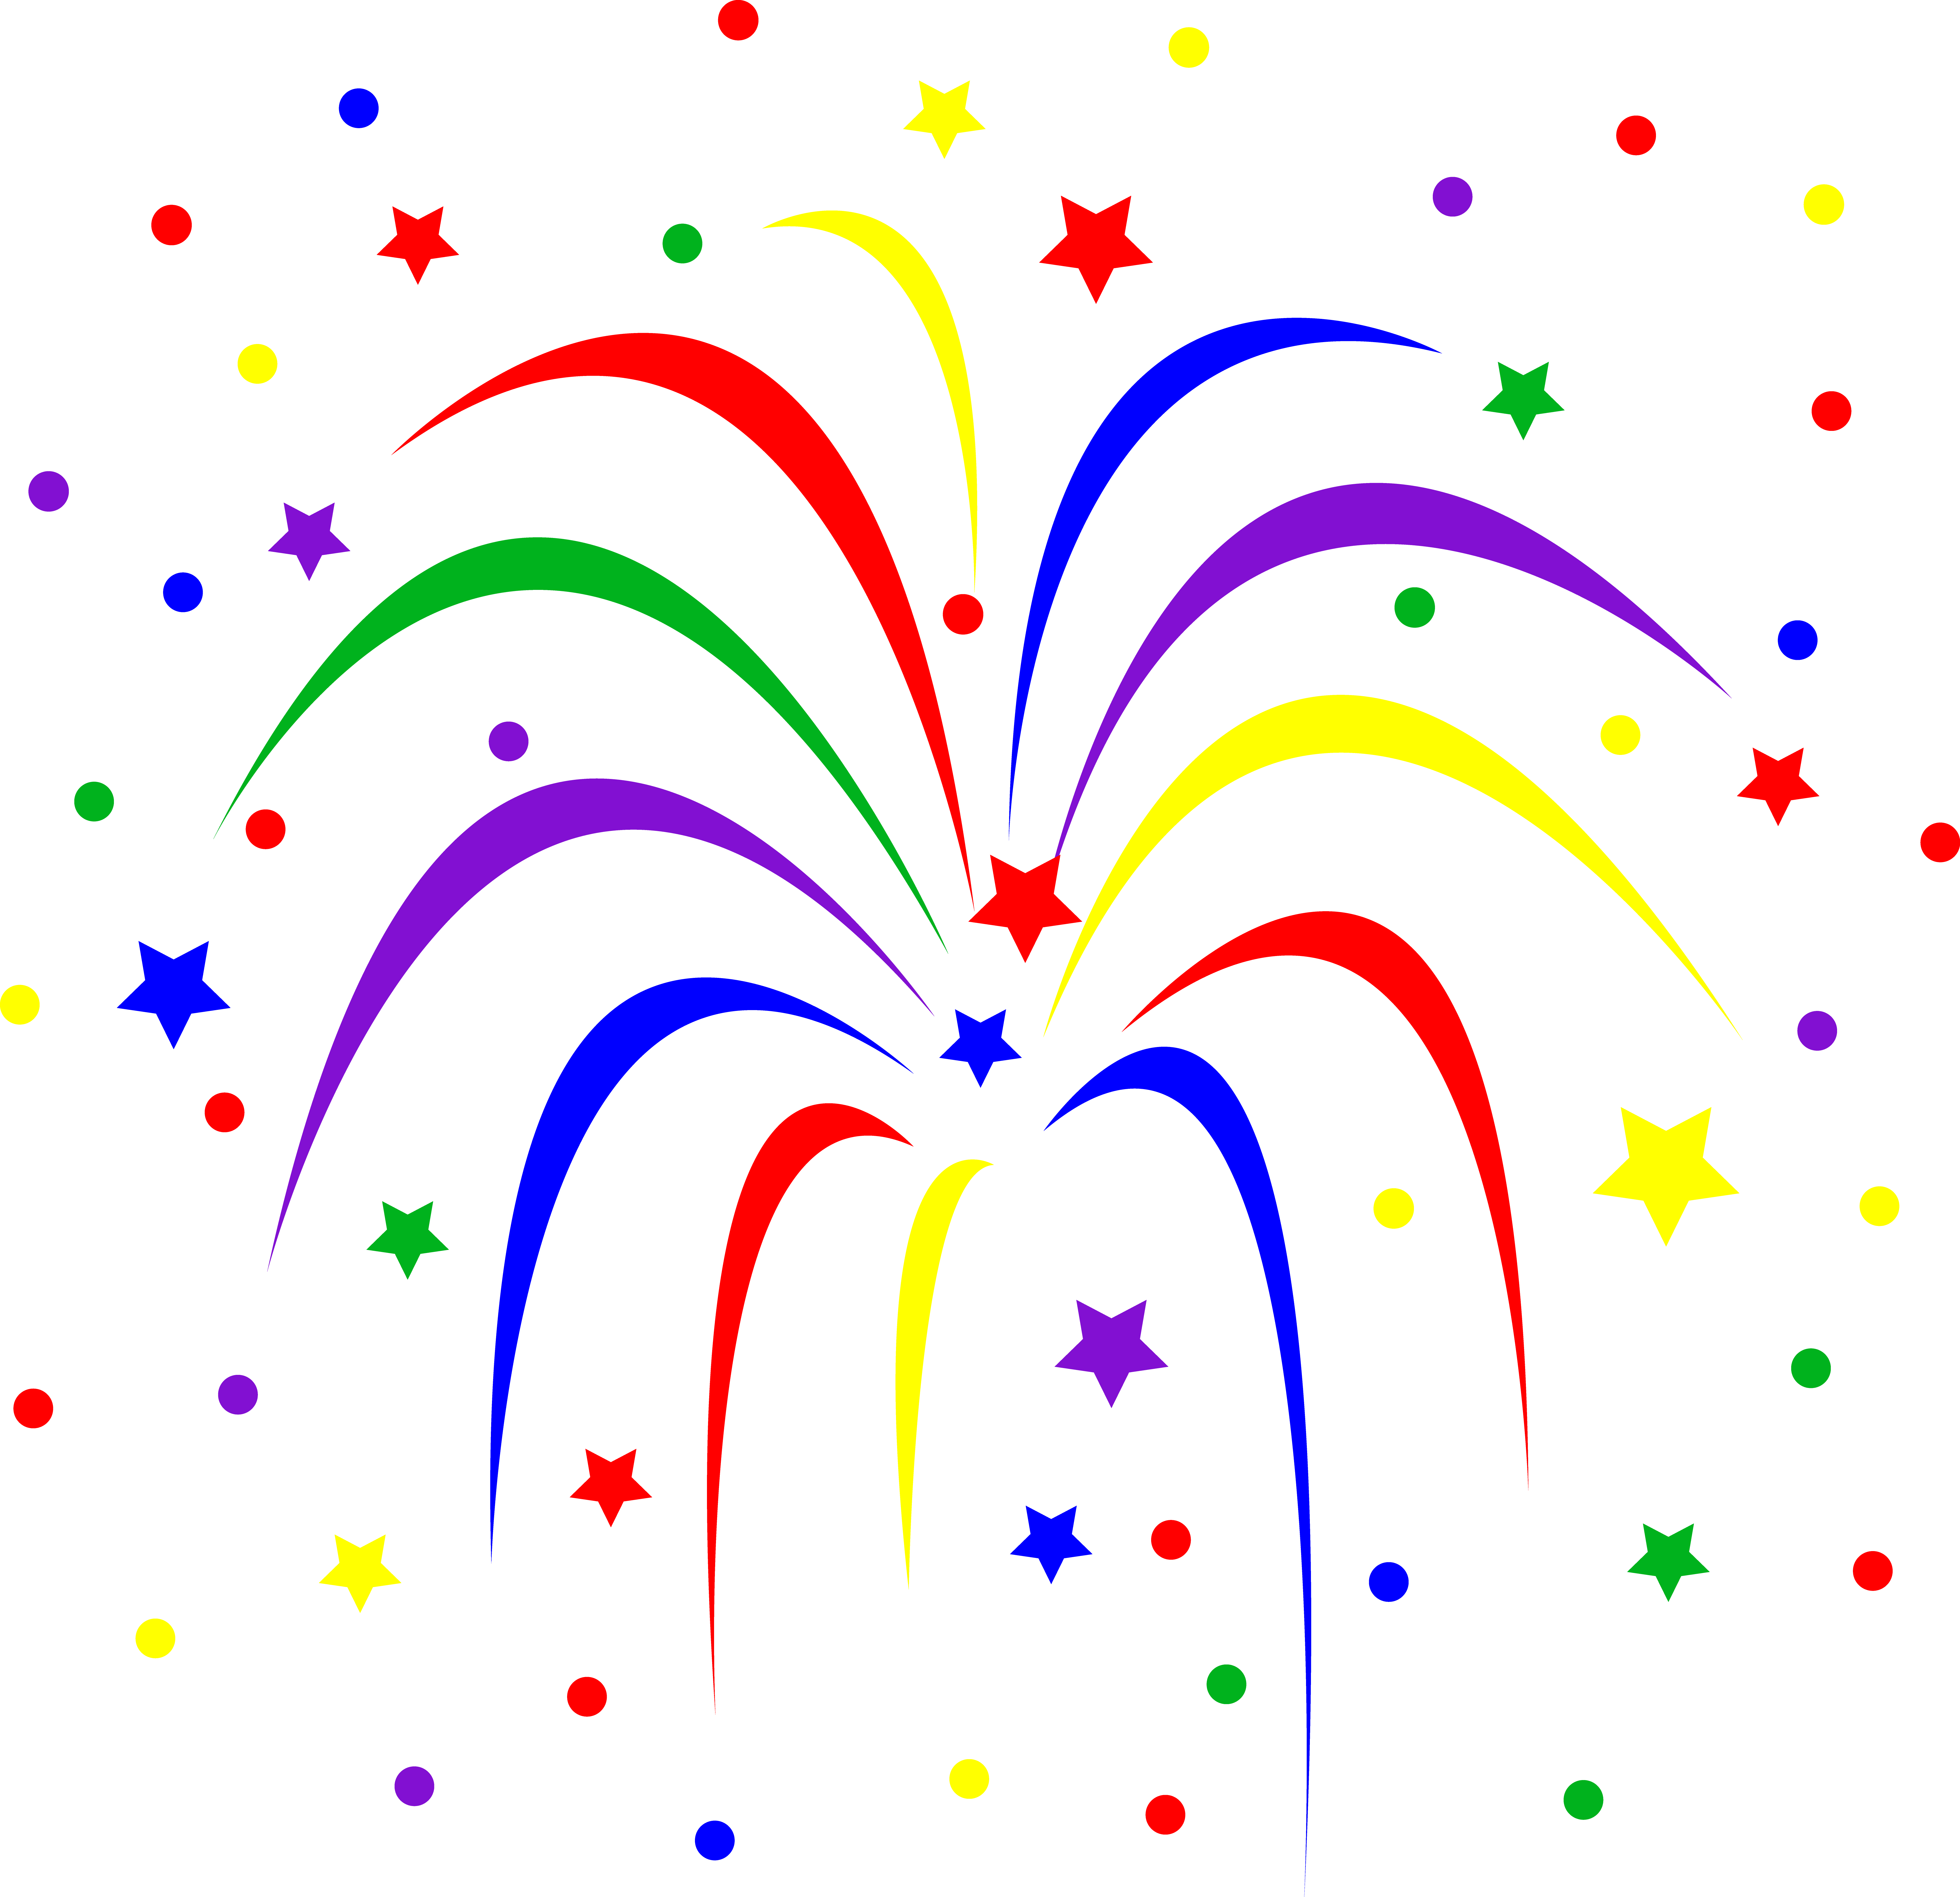 7175x6943 Fireworks Clipart Transparent Clipart Panda